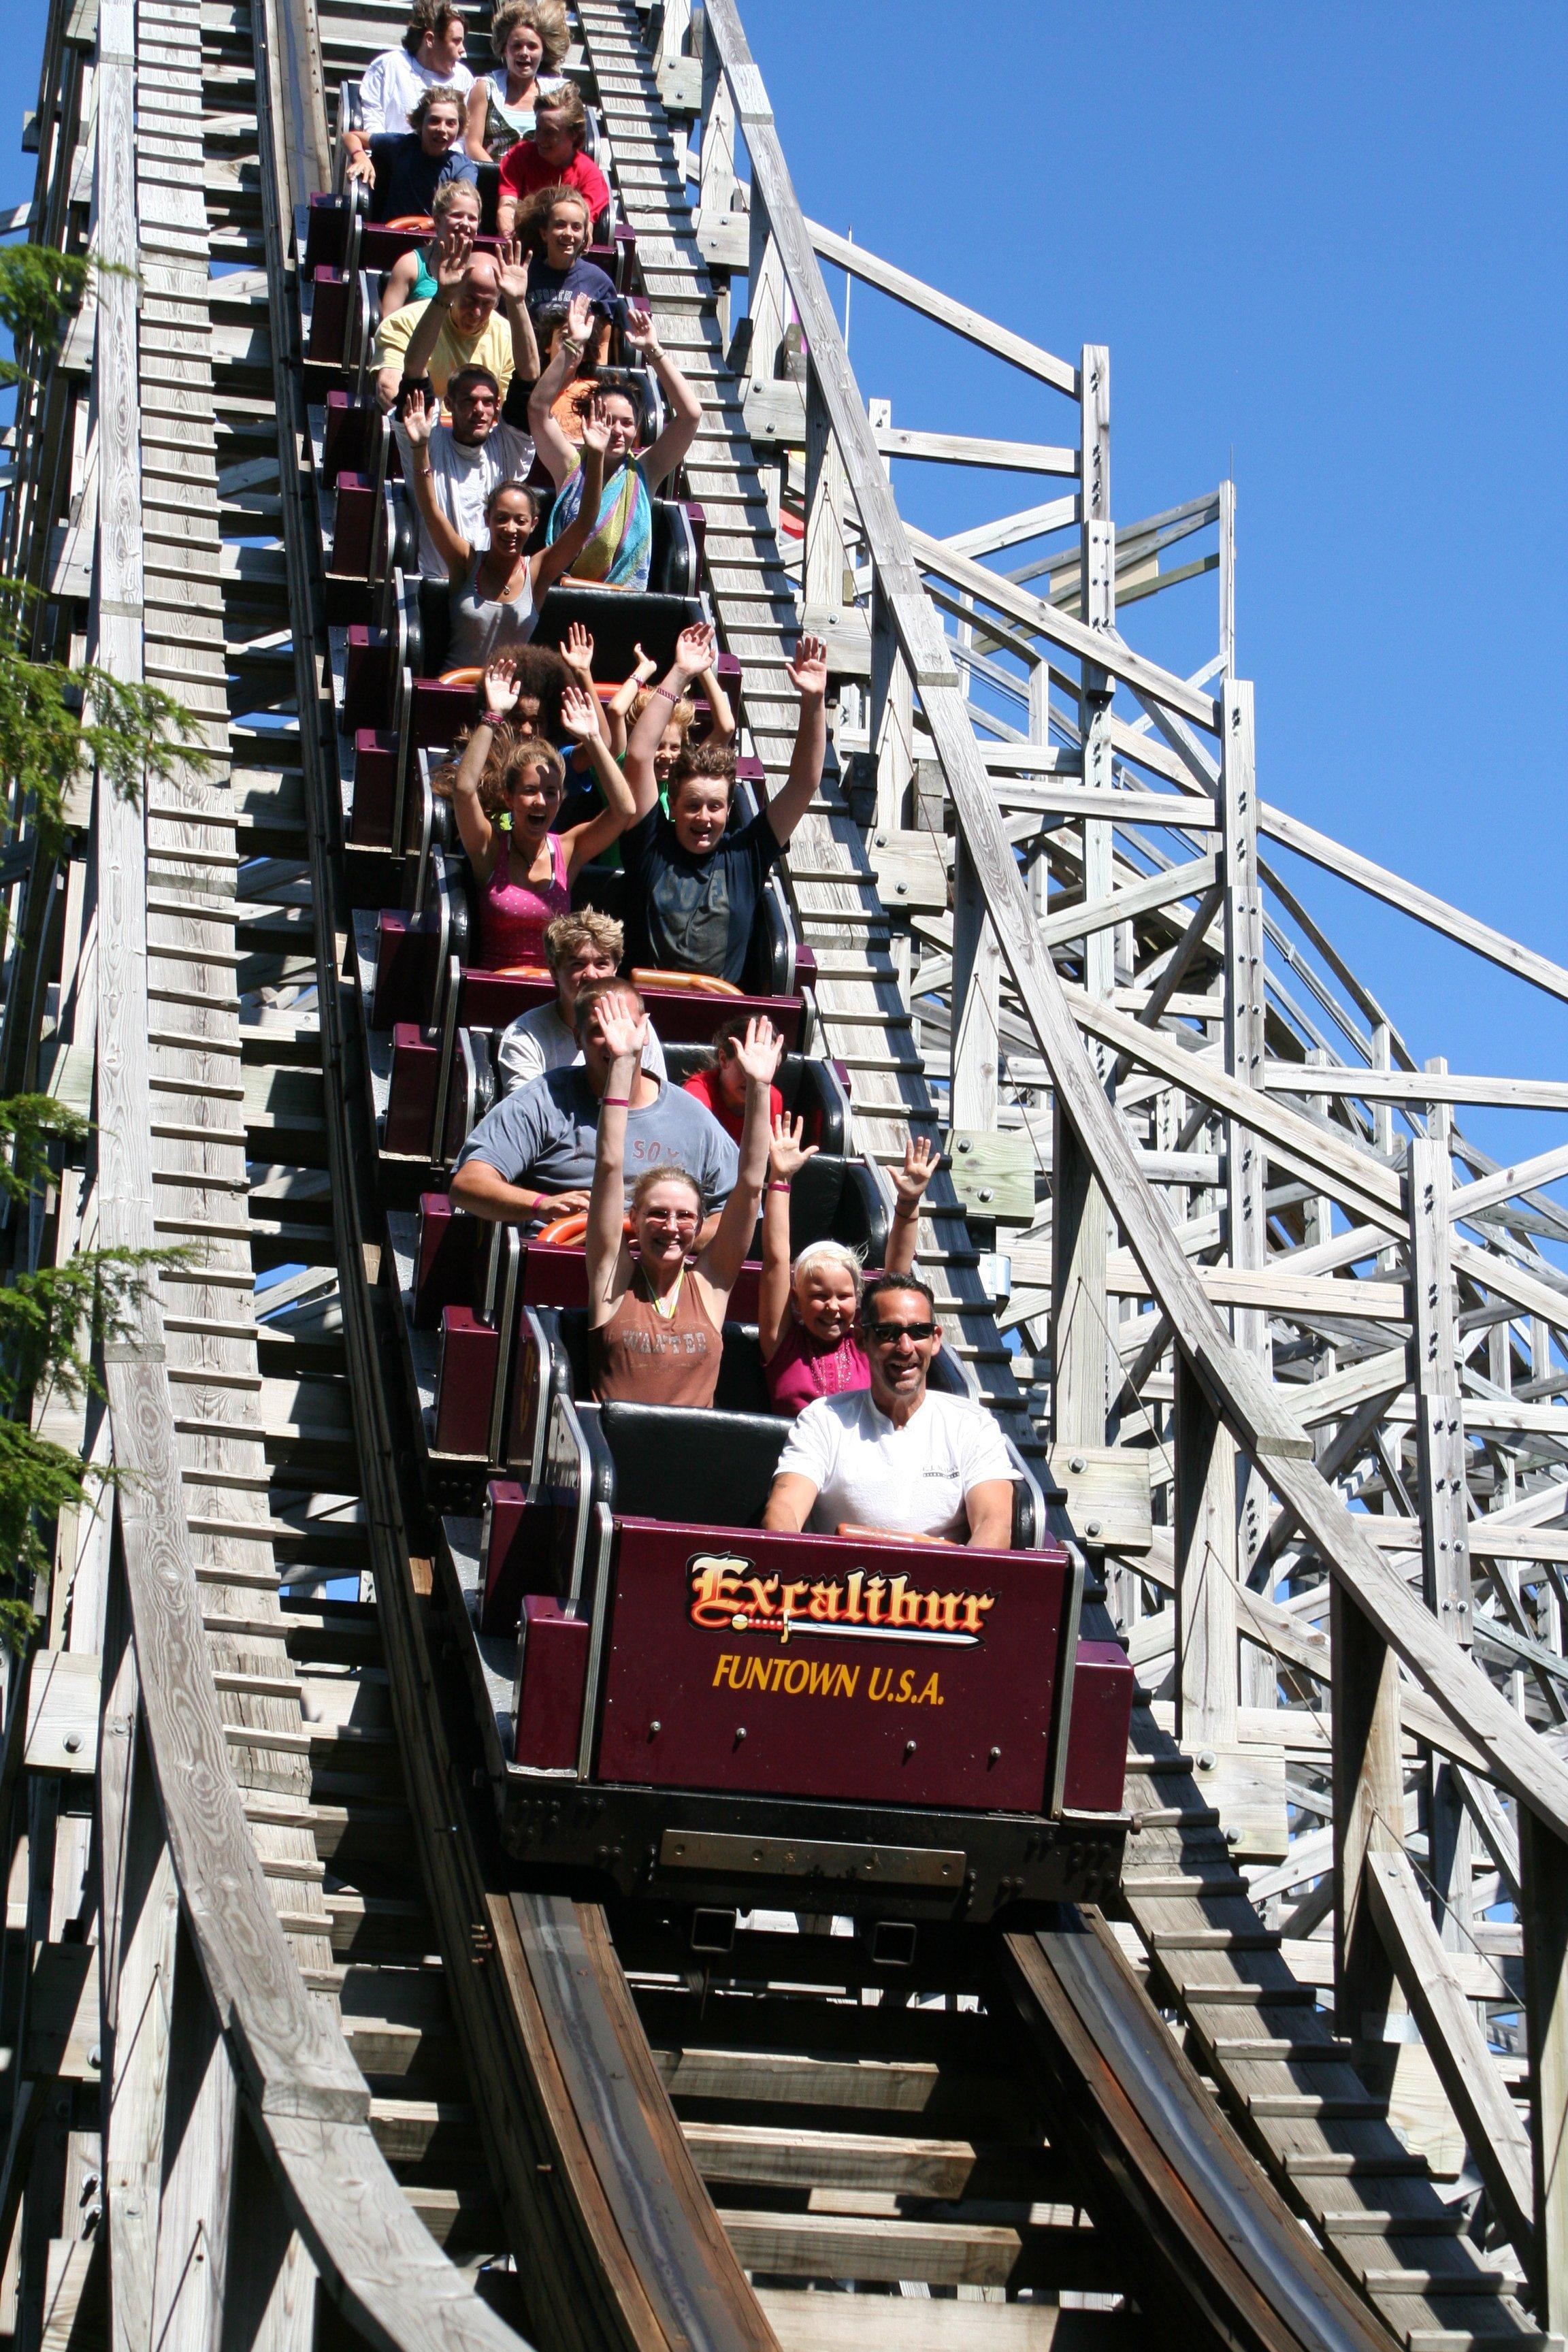 Excalibur Wooden Roller Coaster at Funtown USA Ride Park